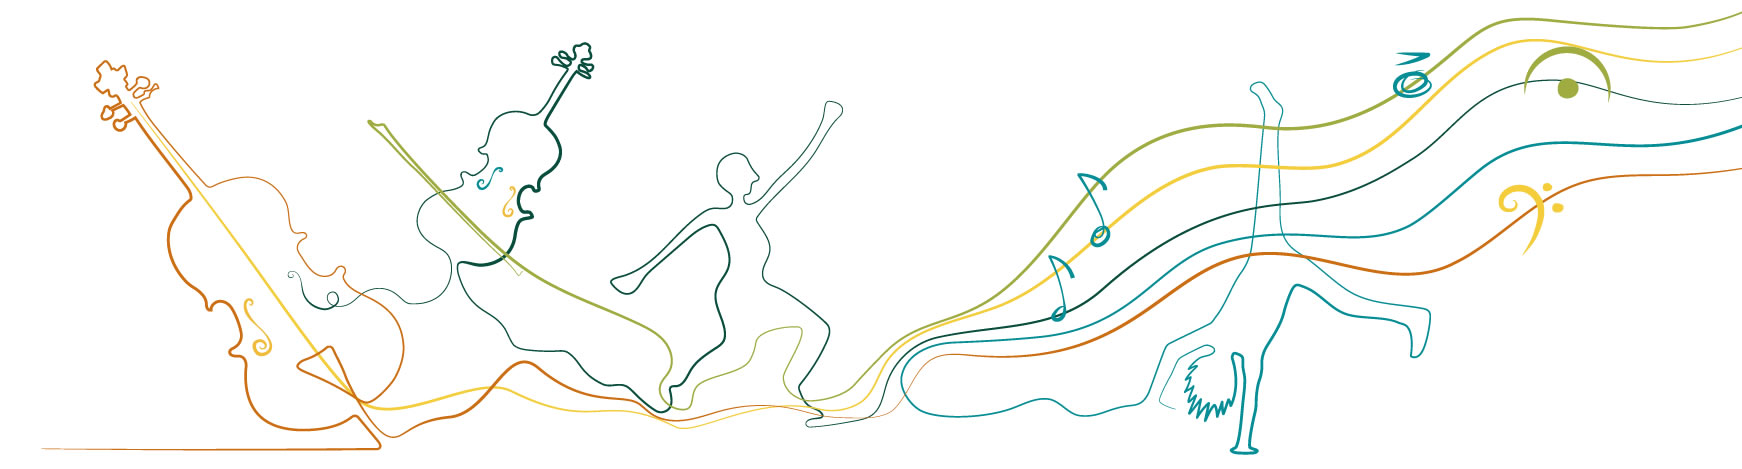 InsideOut Musician banner illustration